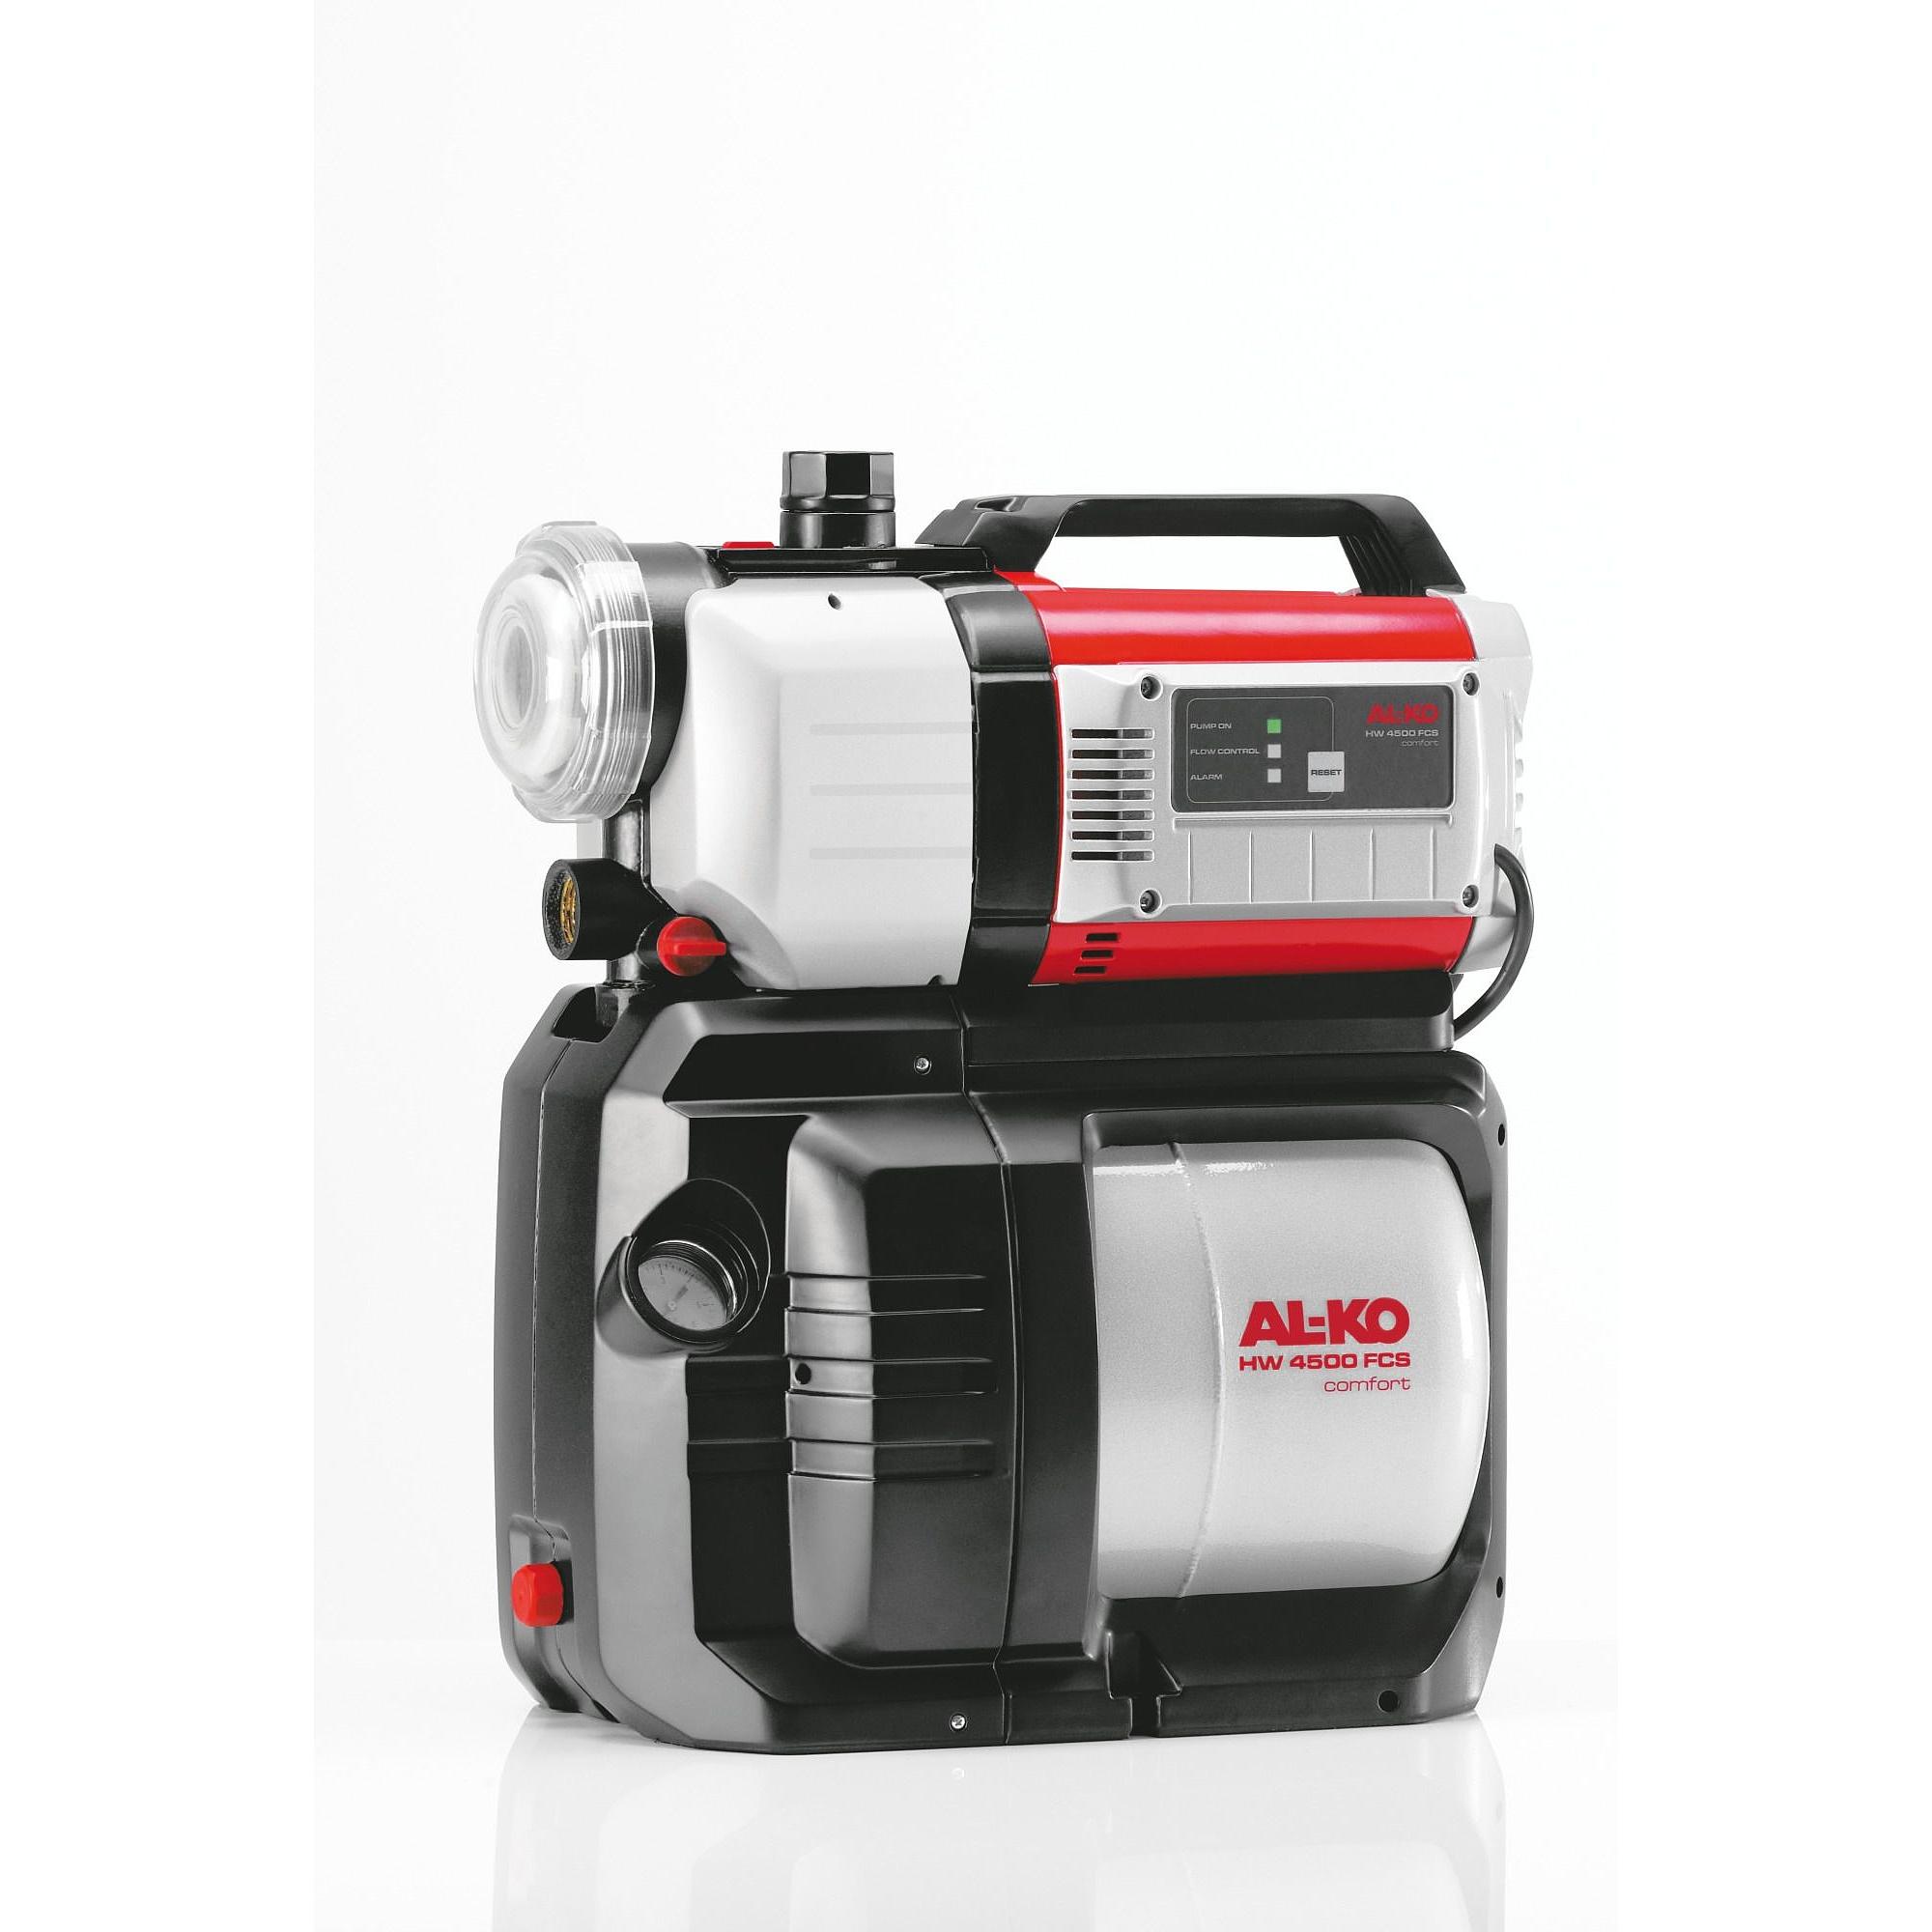 AL-KO Házi vízmű HW 4500 FCS Comfort 112850